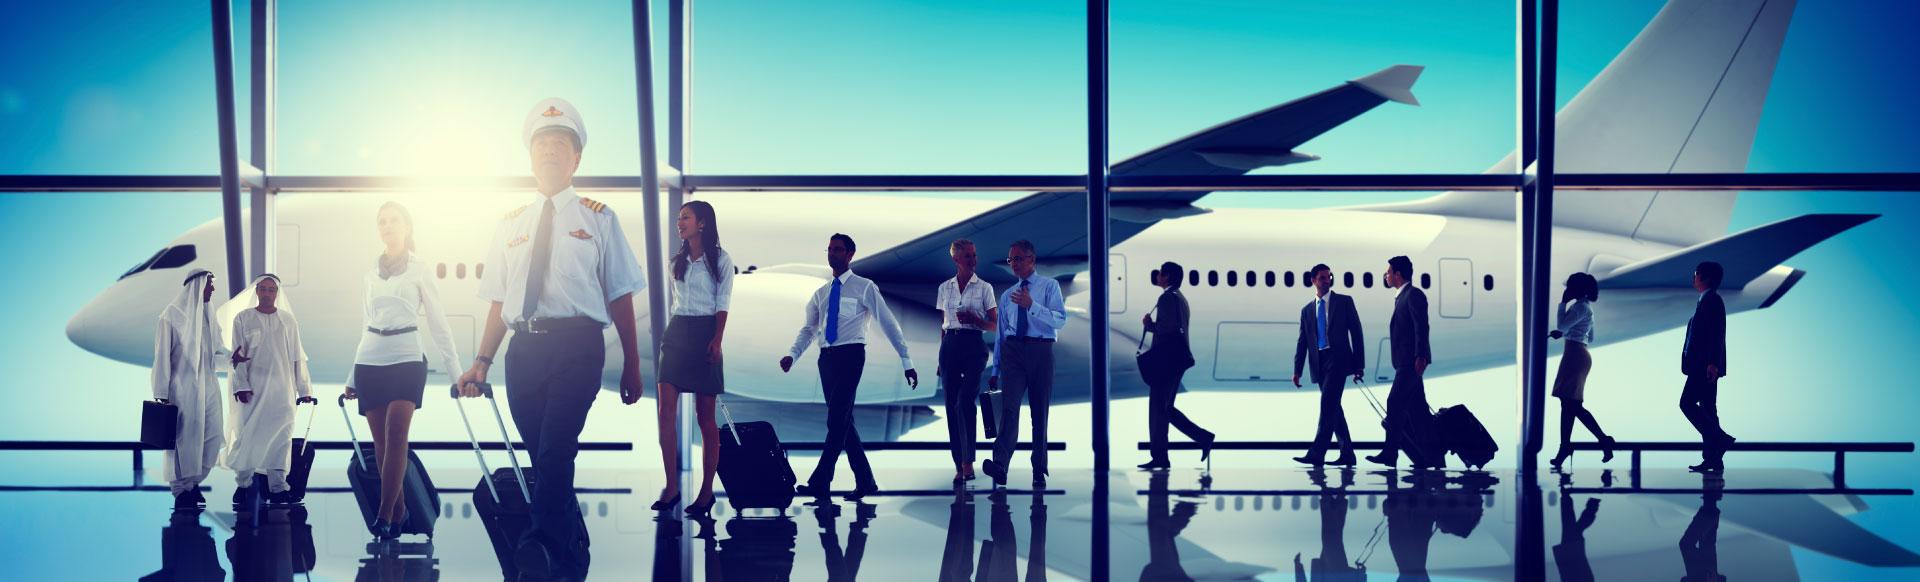 airline crew healing